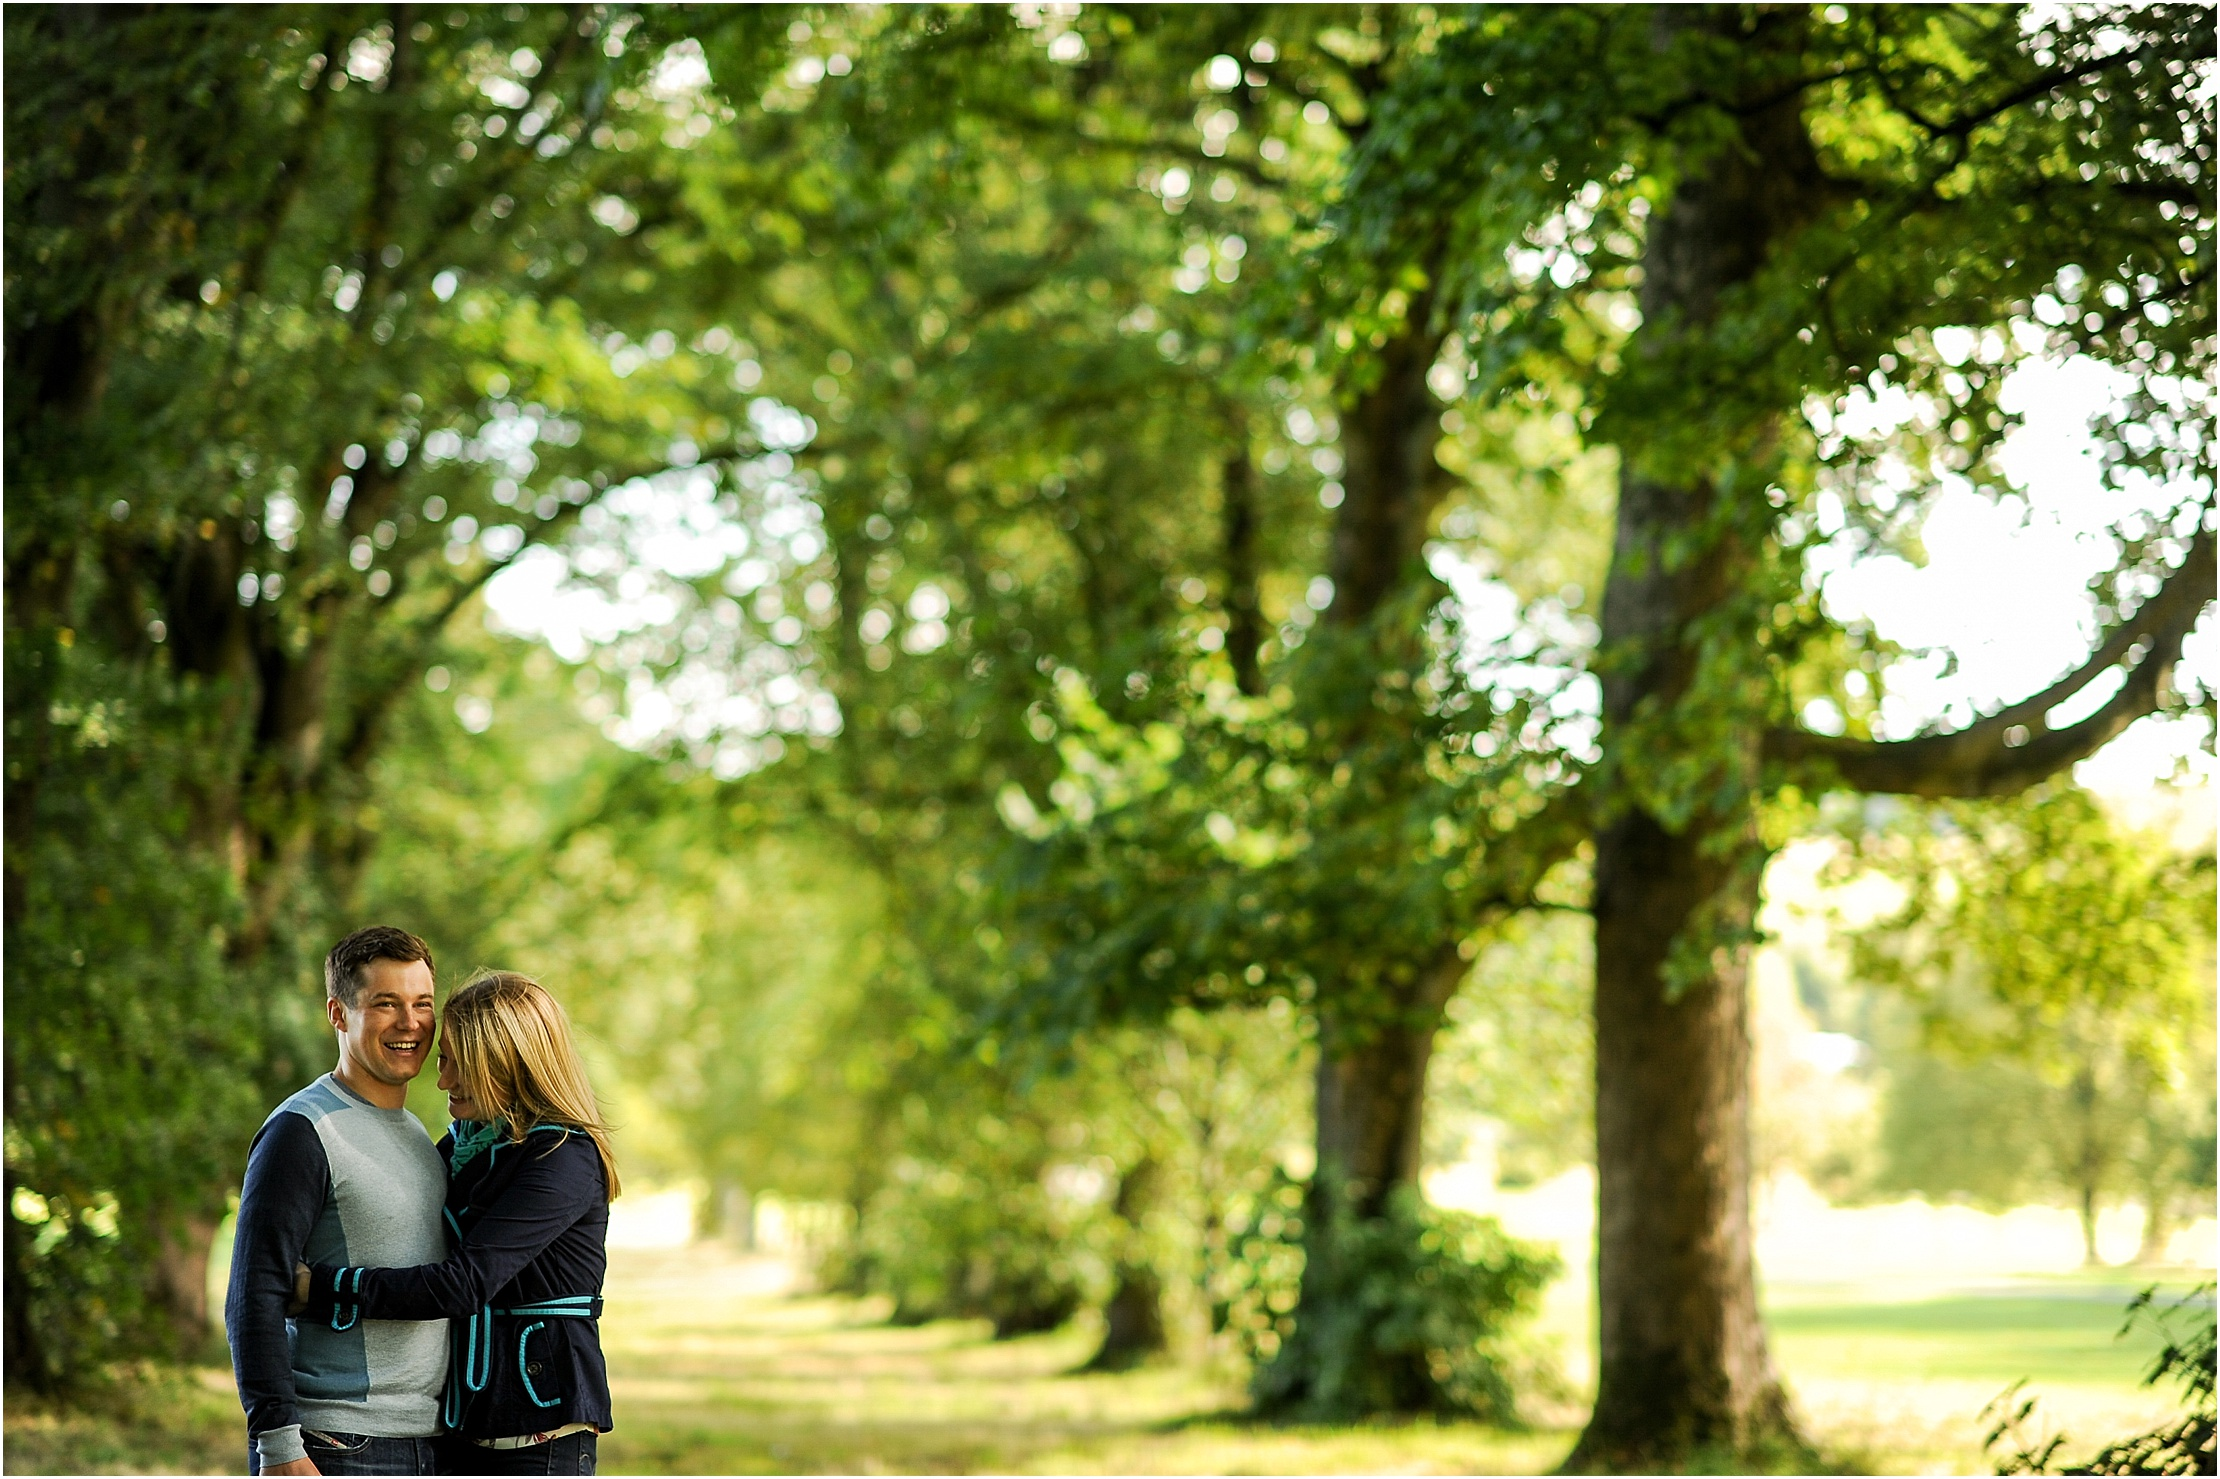 townley-park-pre-wedding-photography-03.jpg